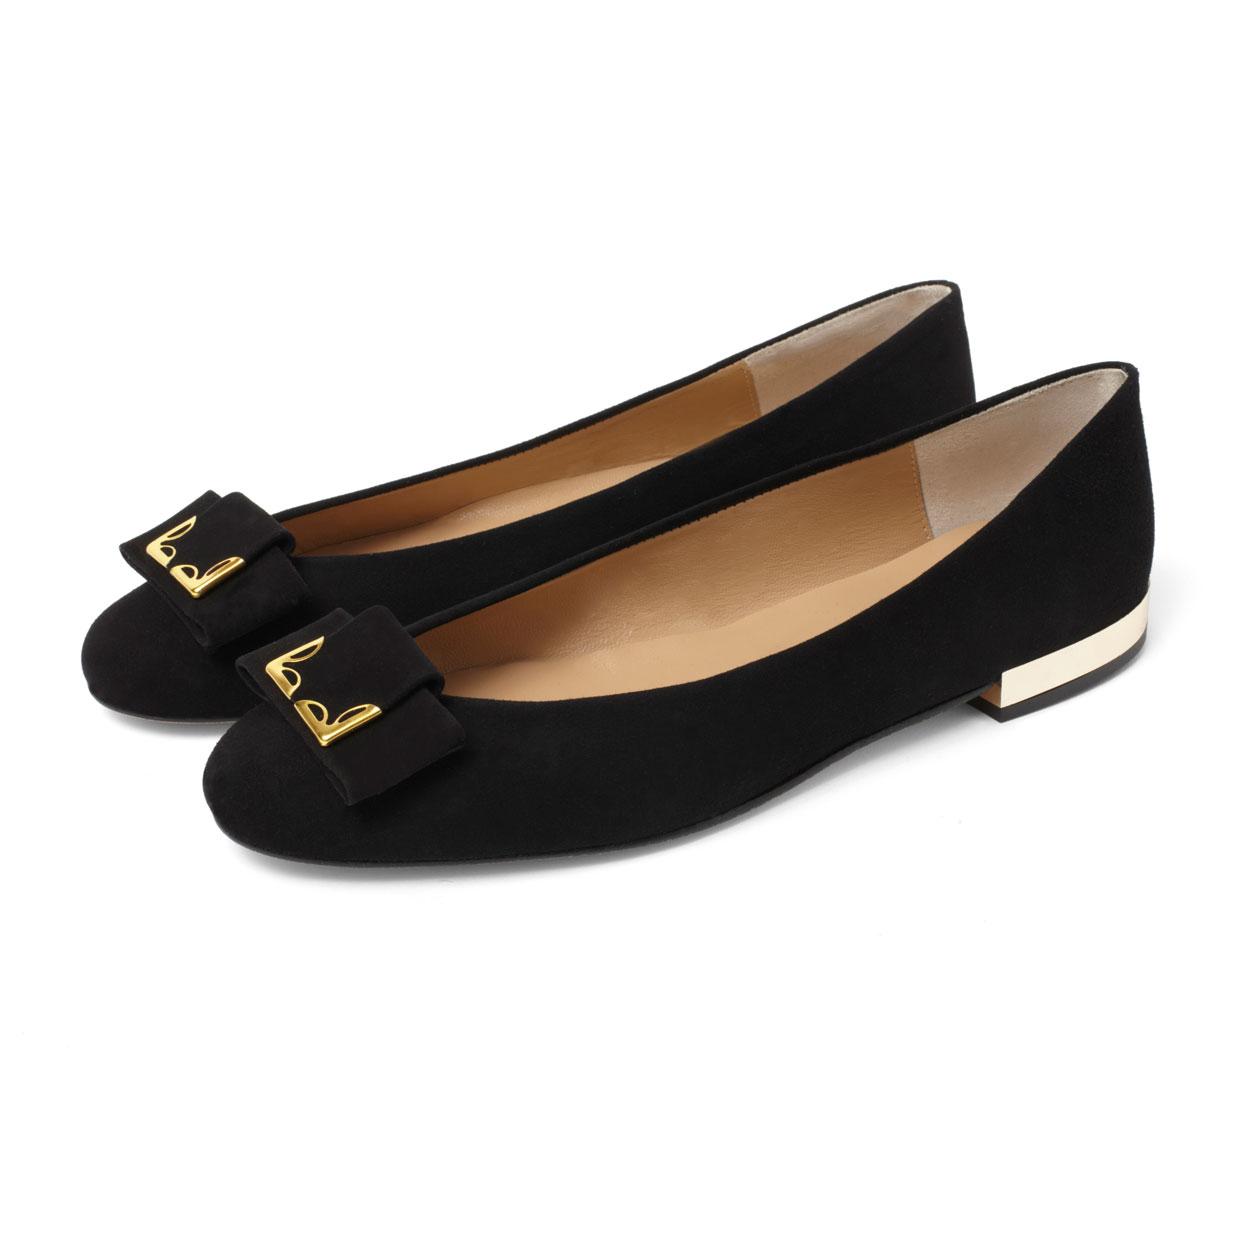 rainbow-clips-black-on-shoes-shoe-design-designer-cleob-fashion-london.jpg